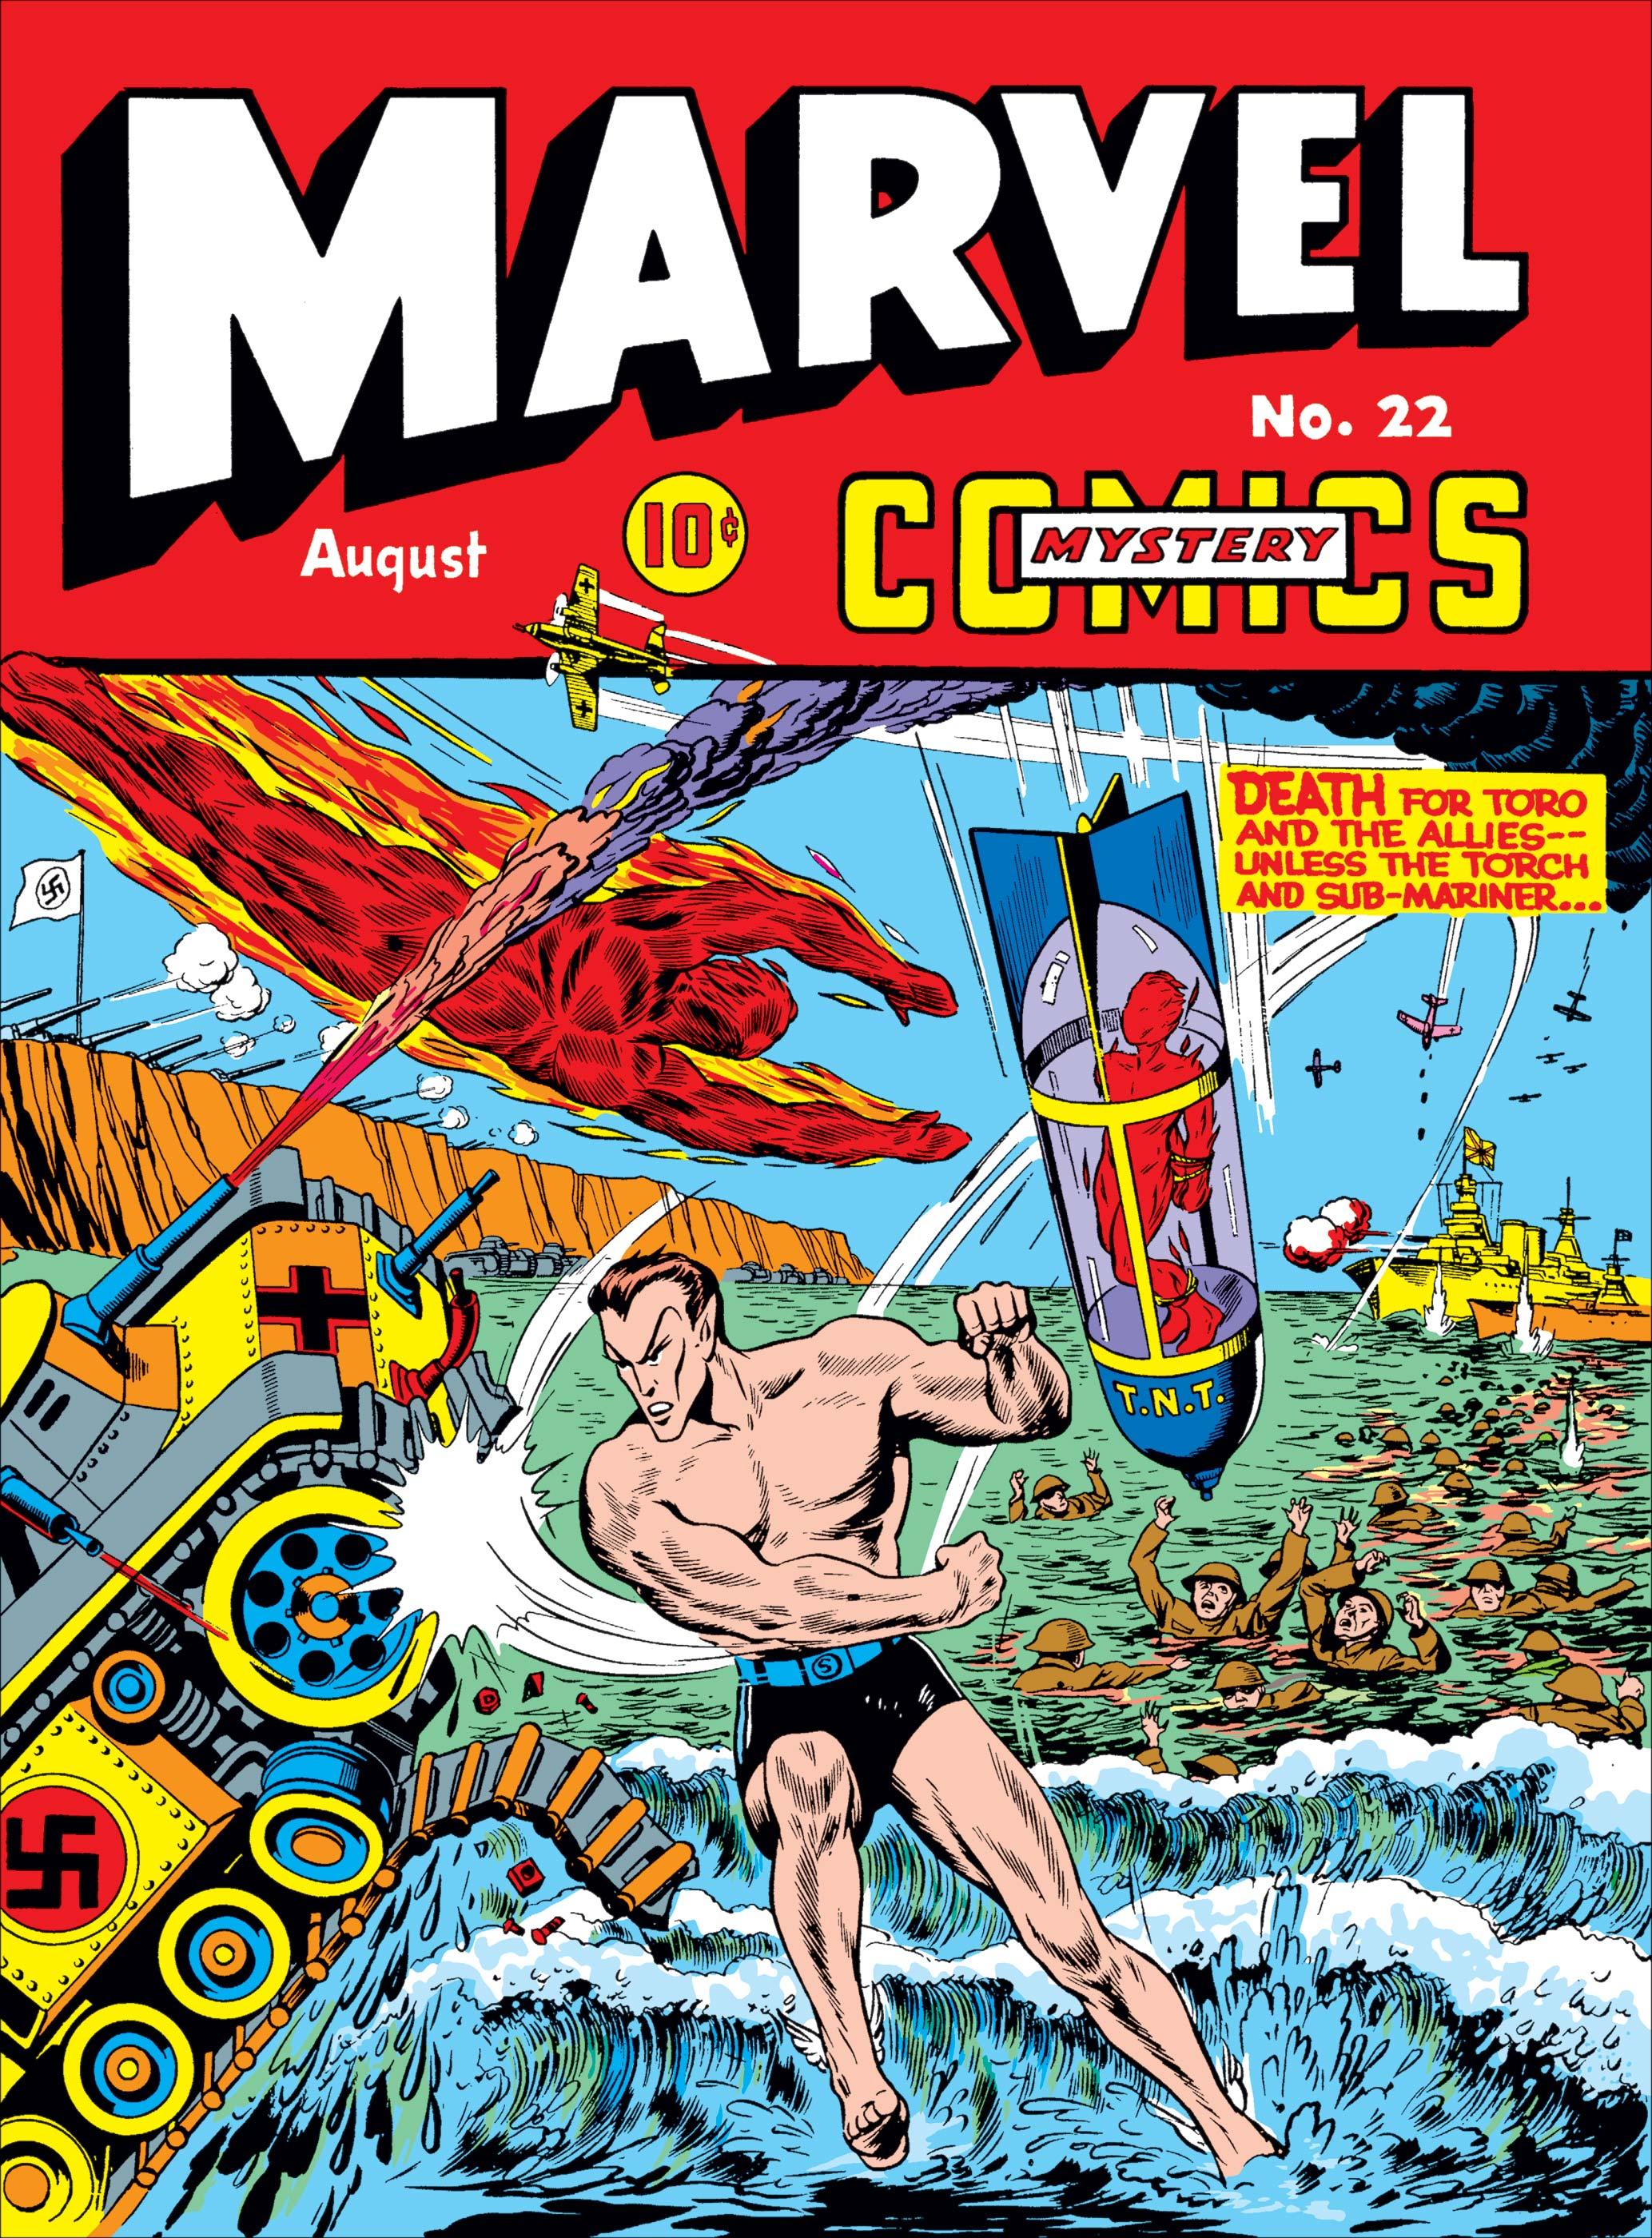 Marvel Mystery Comics (1939) #22